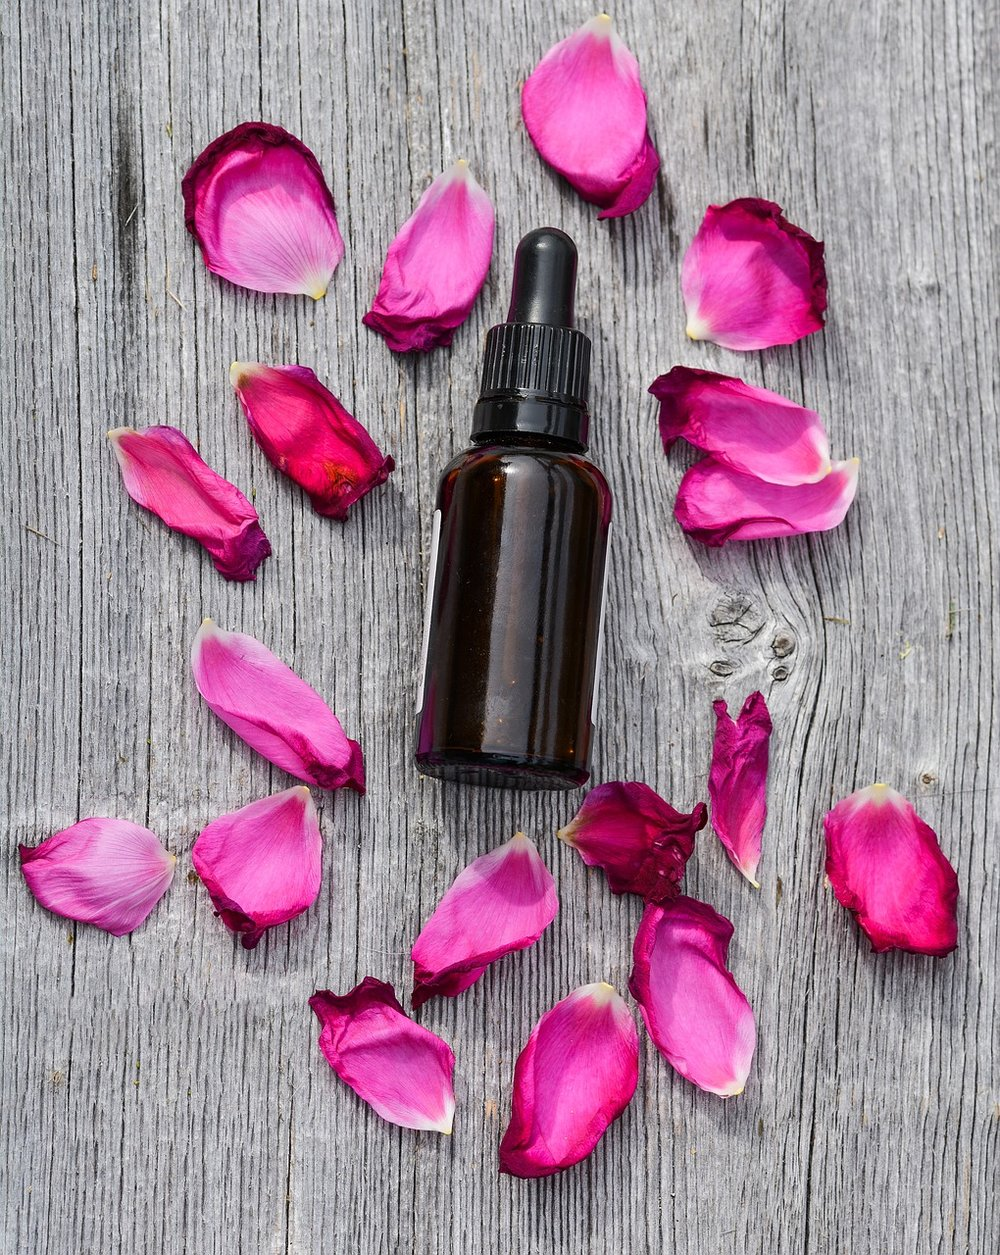 essential-oils-2535233_1280.jpg